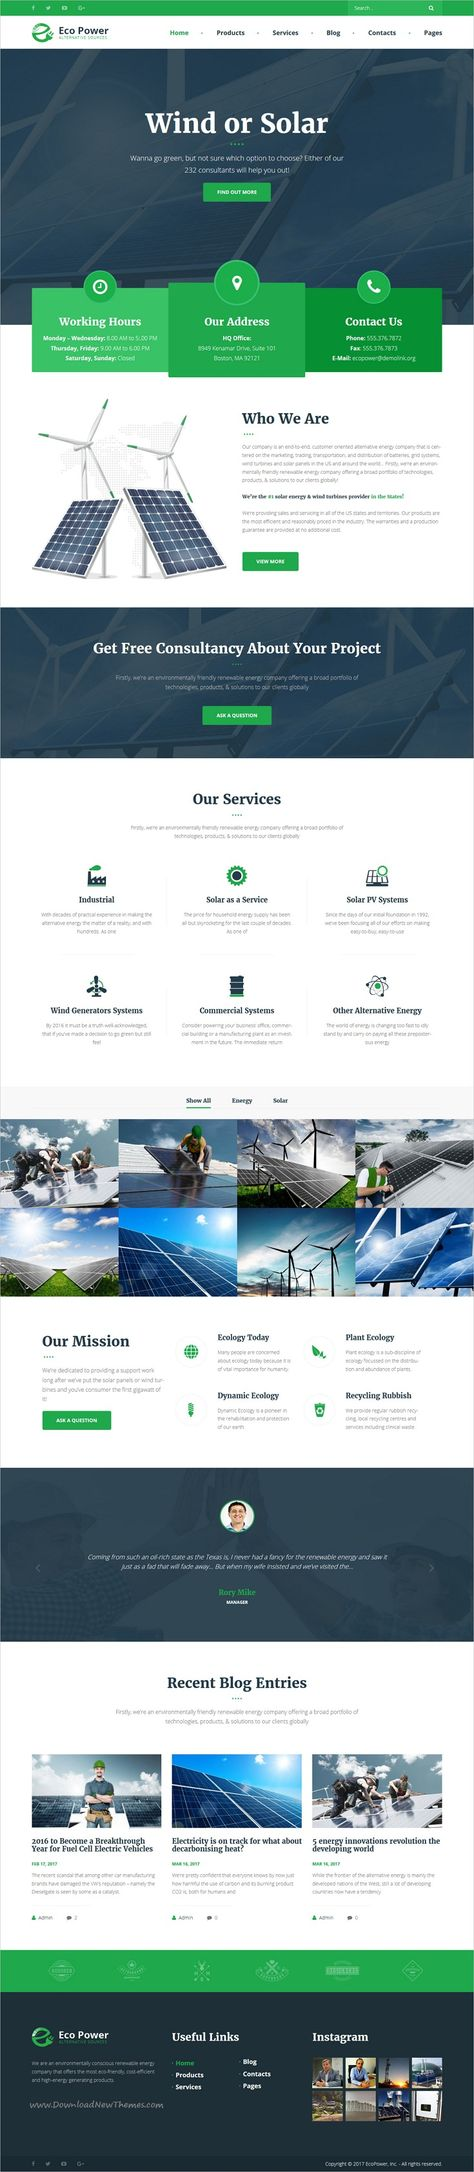 EcoPower - Alternative Power & Solar Energy Company